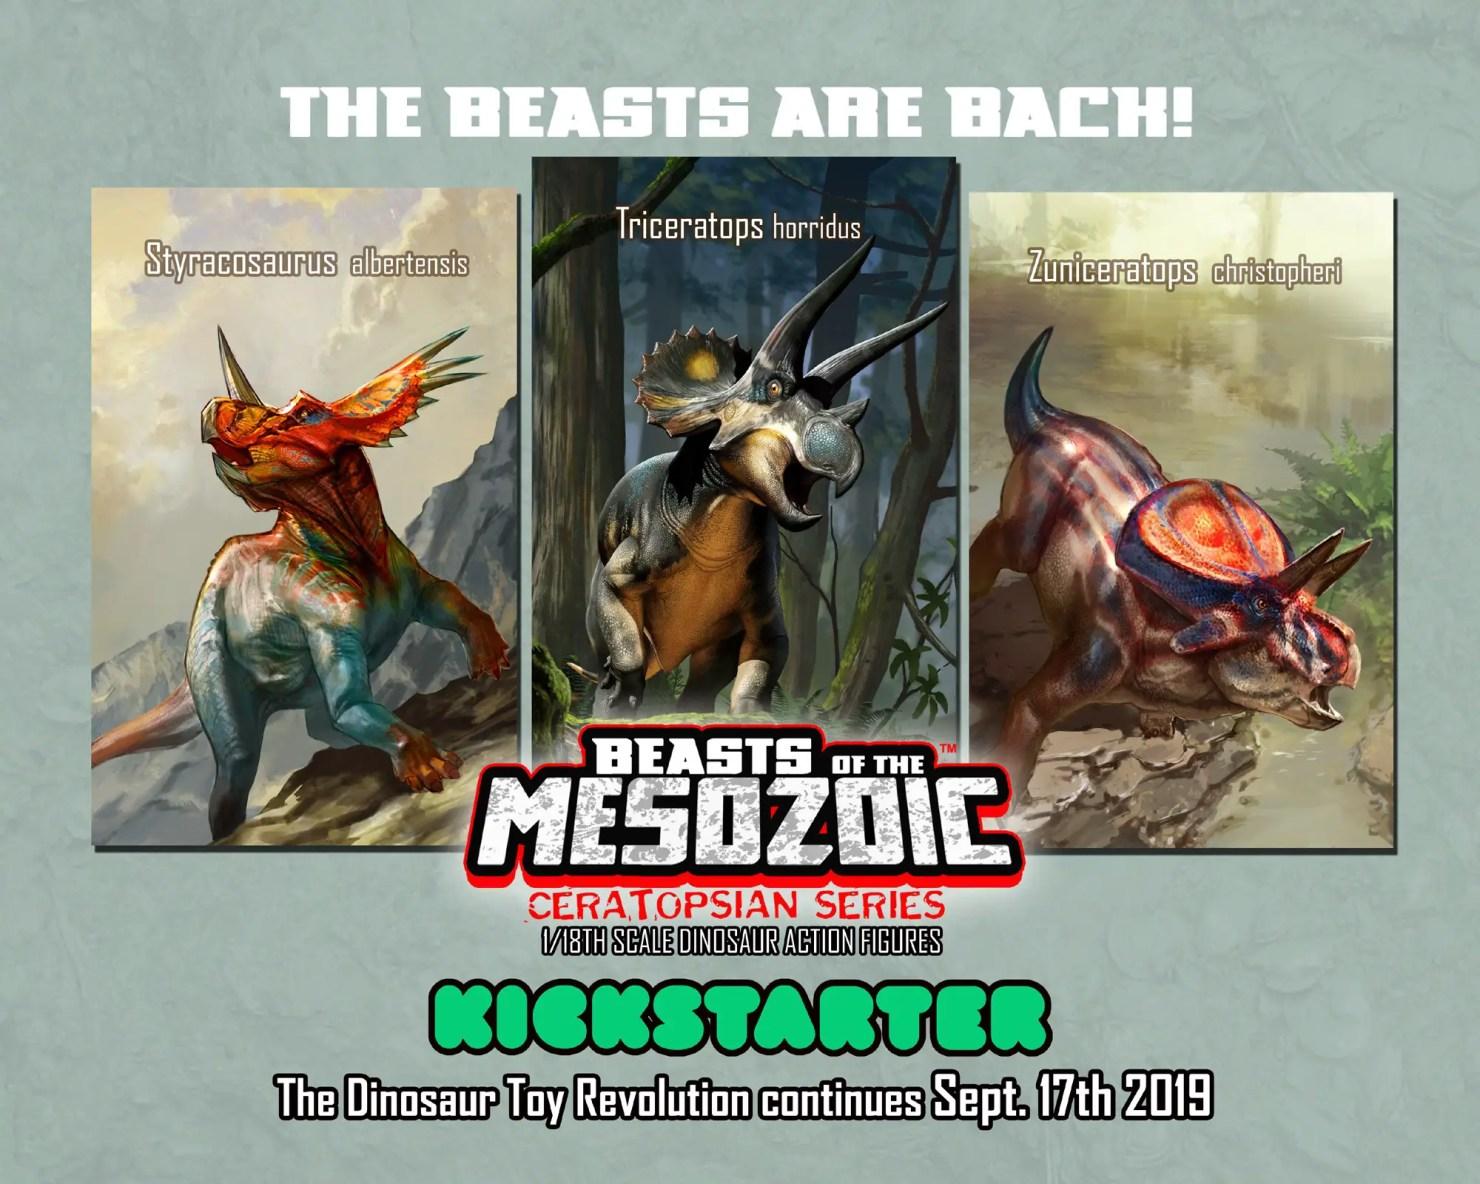 Beasts of the Mesozoic: Ceratopsian Series Kickstarter is already fully funded